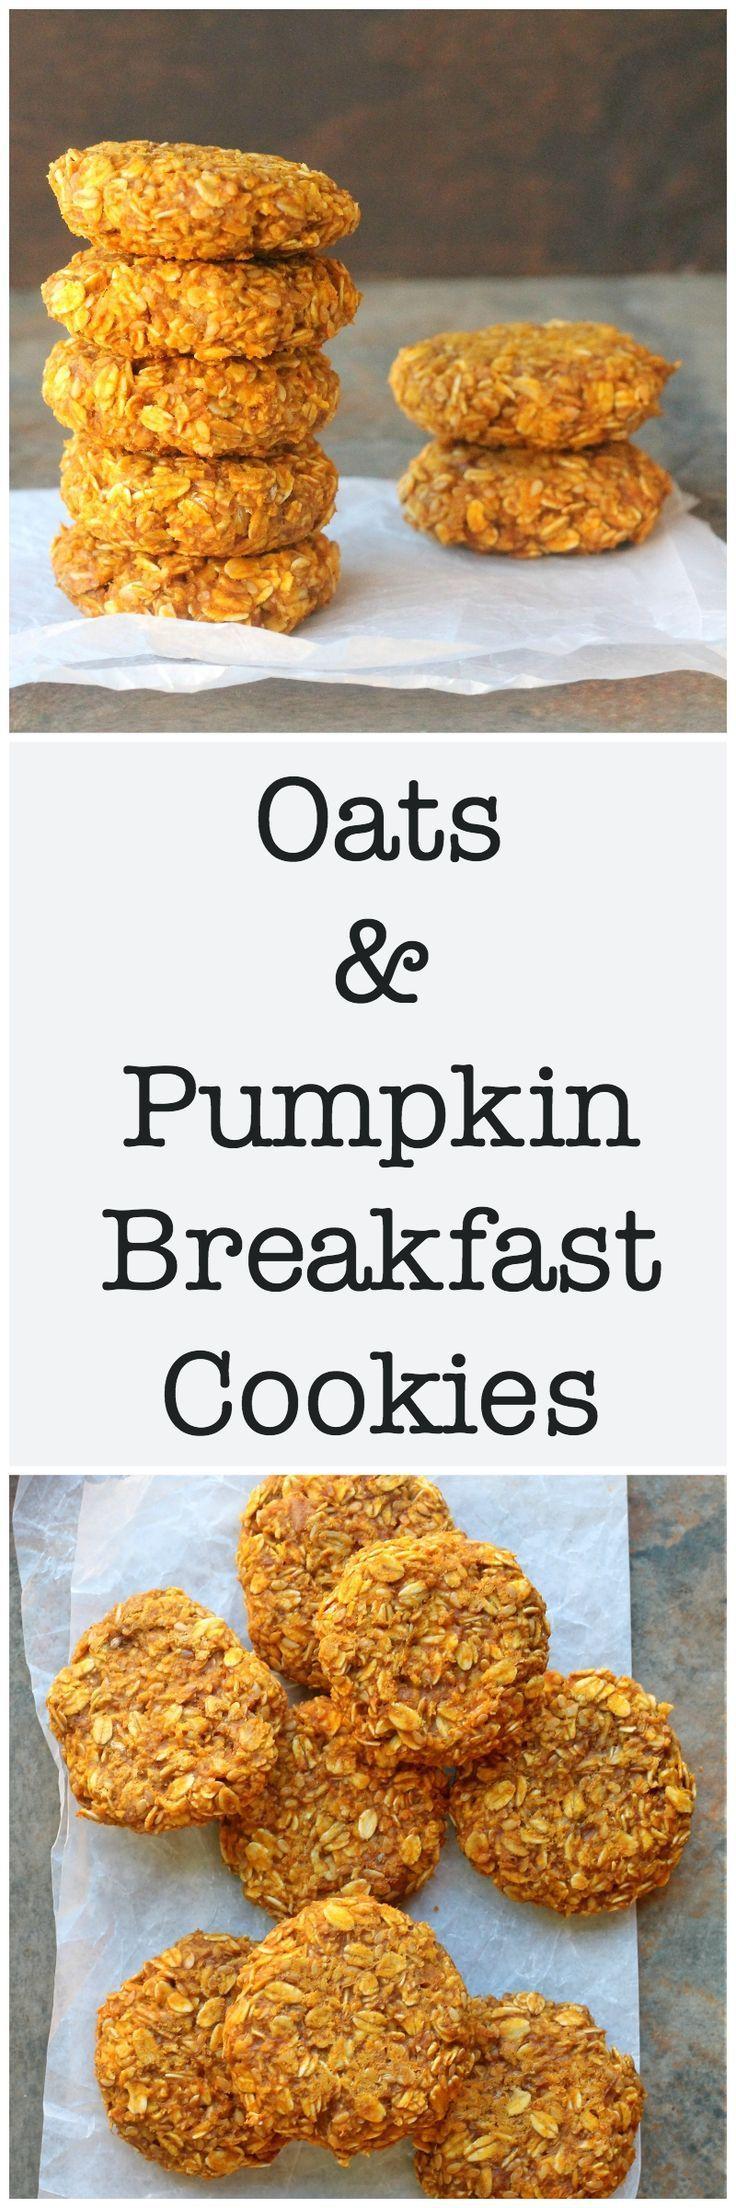 1000+ images about pumpkin flavored food on Pinterest | Pumpkins ...